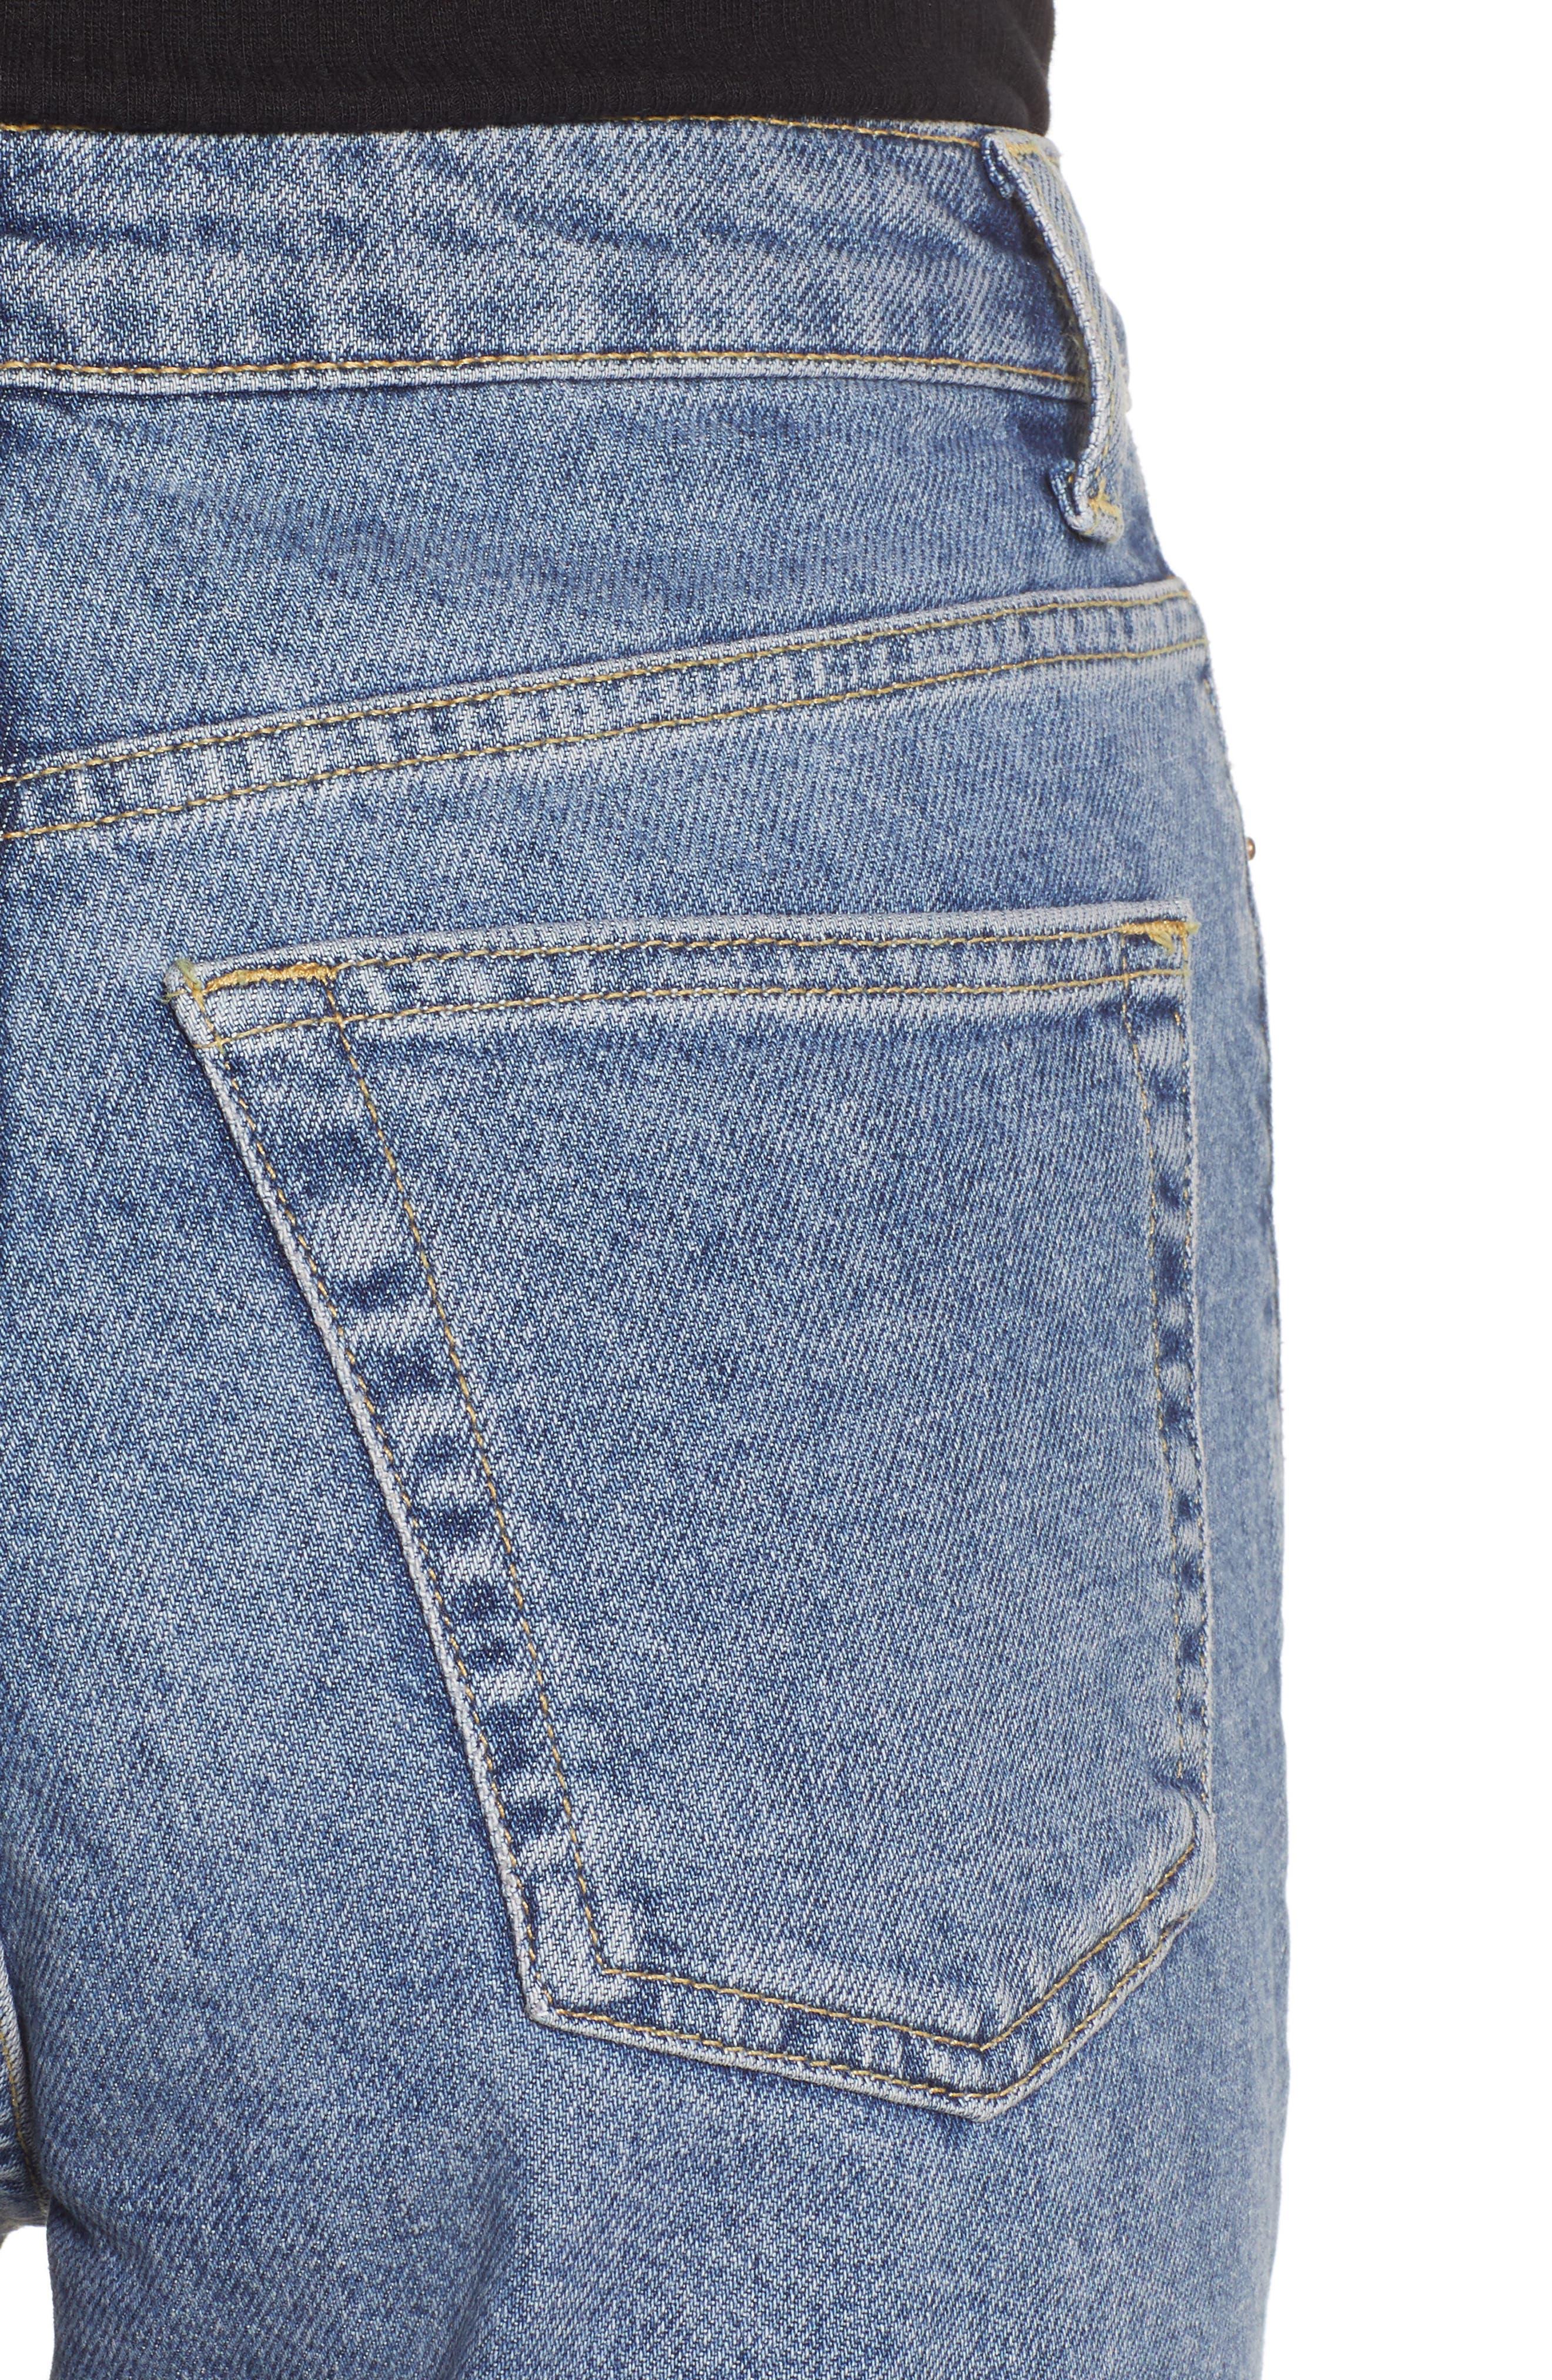 Raw Hem Straight Leg Jeans,                             Alternate thumbnail 4, color,                             MID BLUE